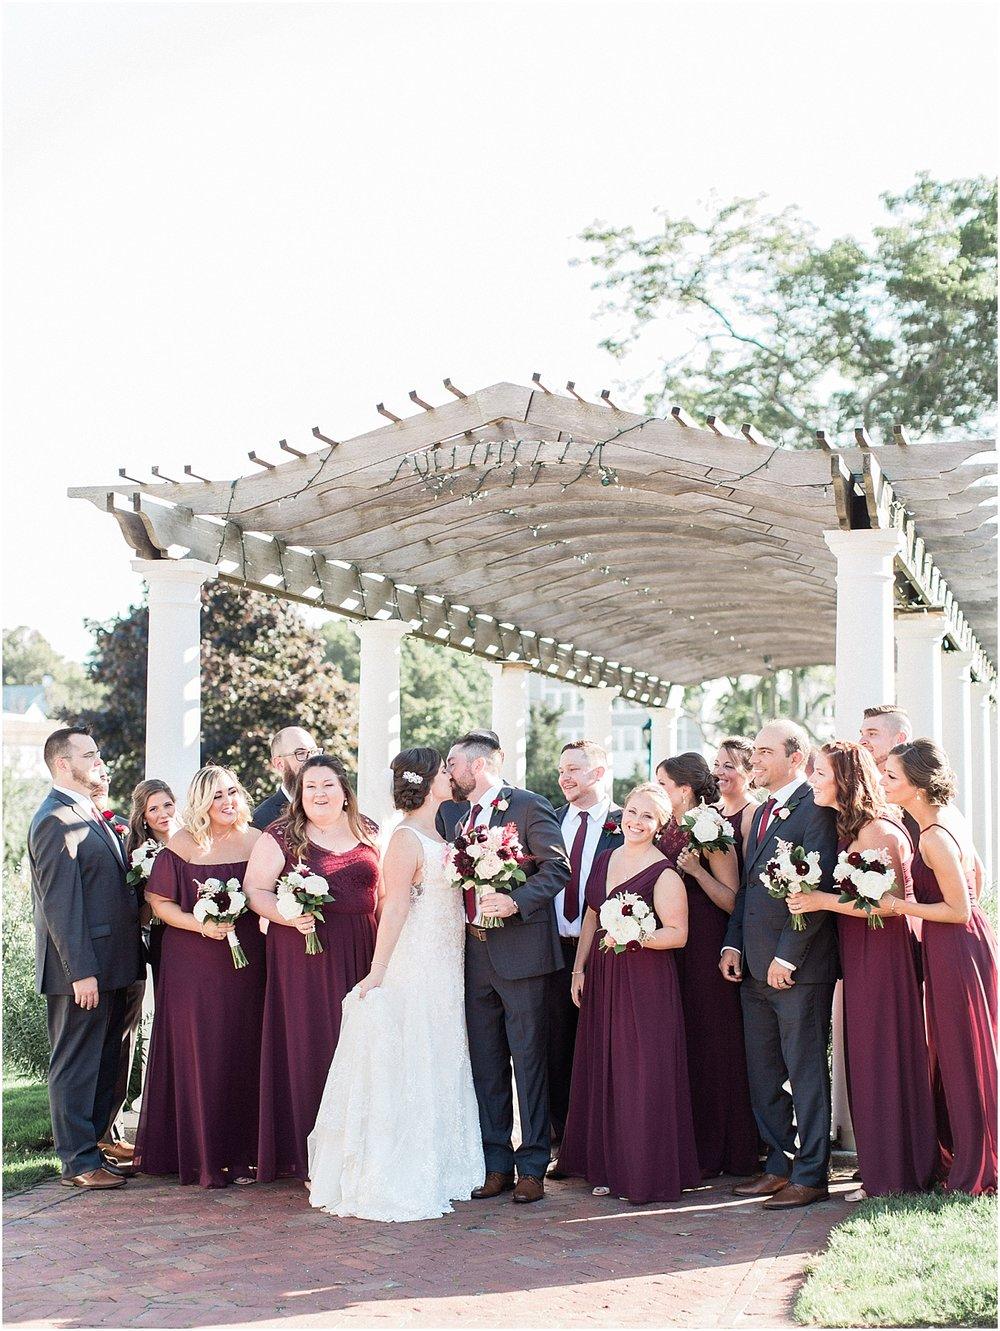 kim_matt_indian_pond_country_club_fall_burgundy_cape_cod_boston_wedding_photographer_meredith_jane_photography_photo_0980.jpg